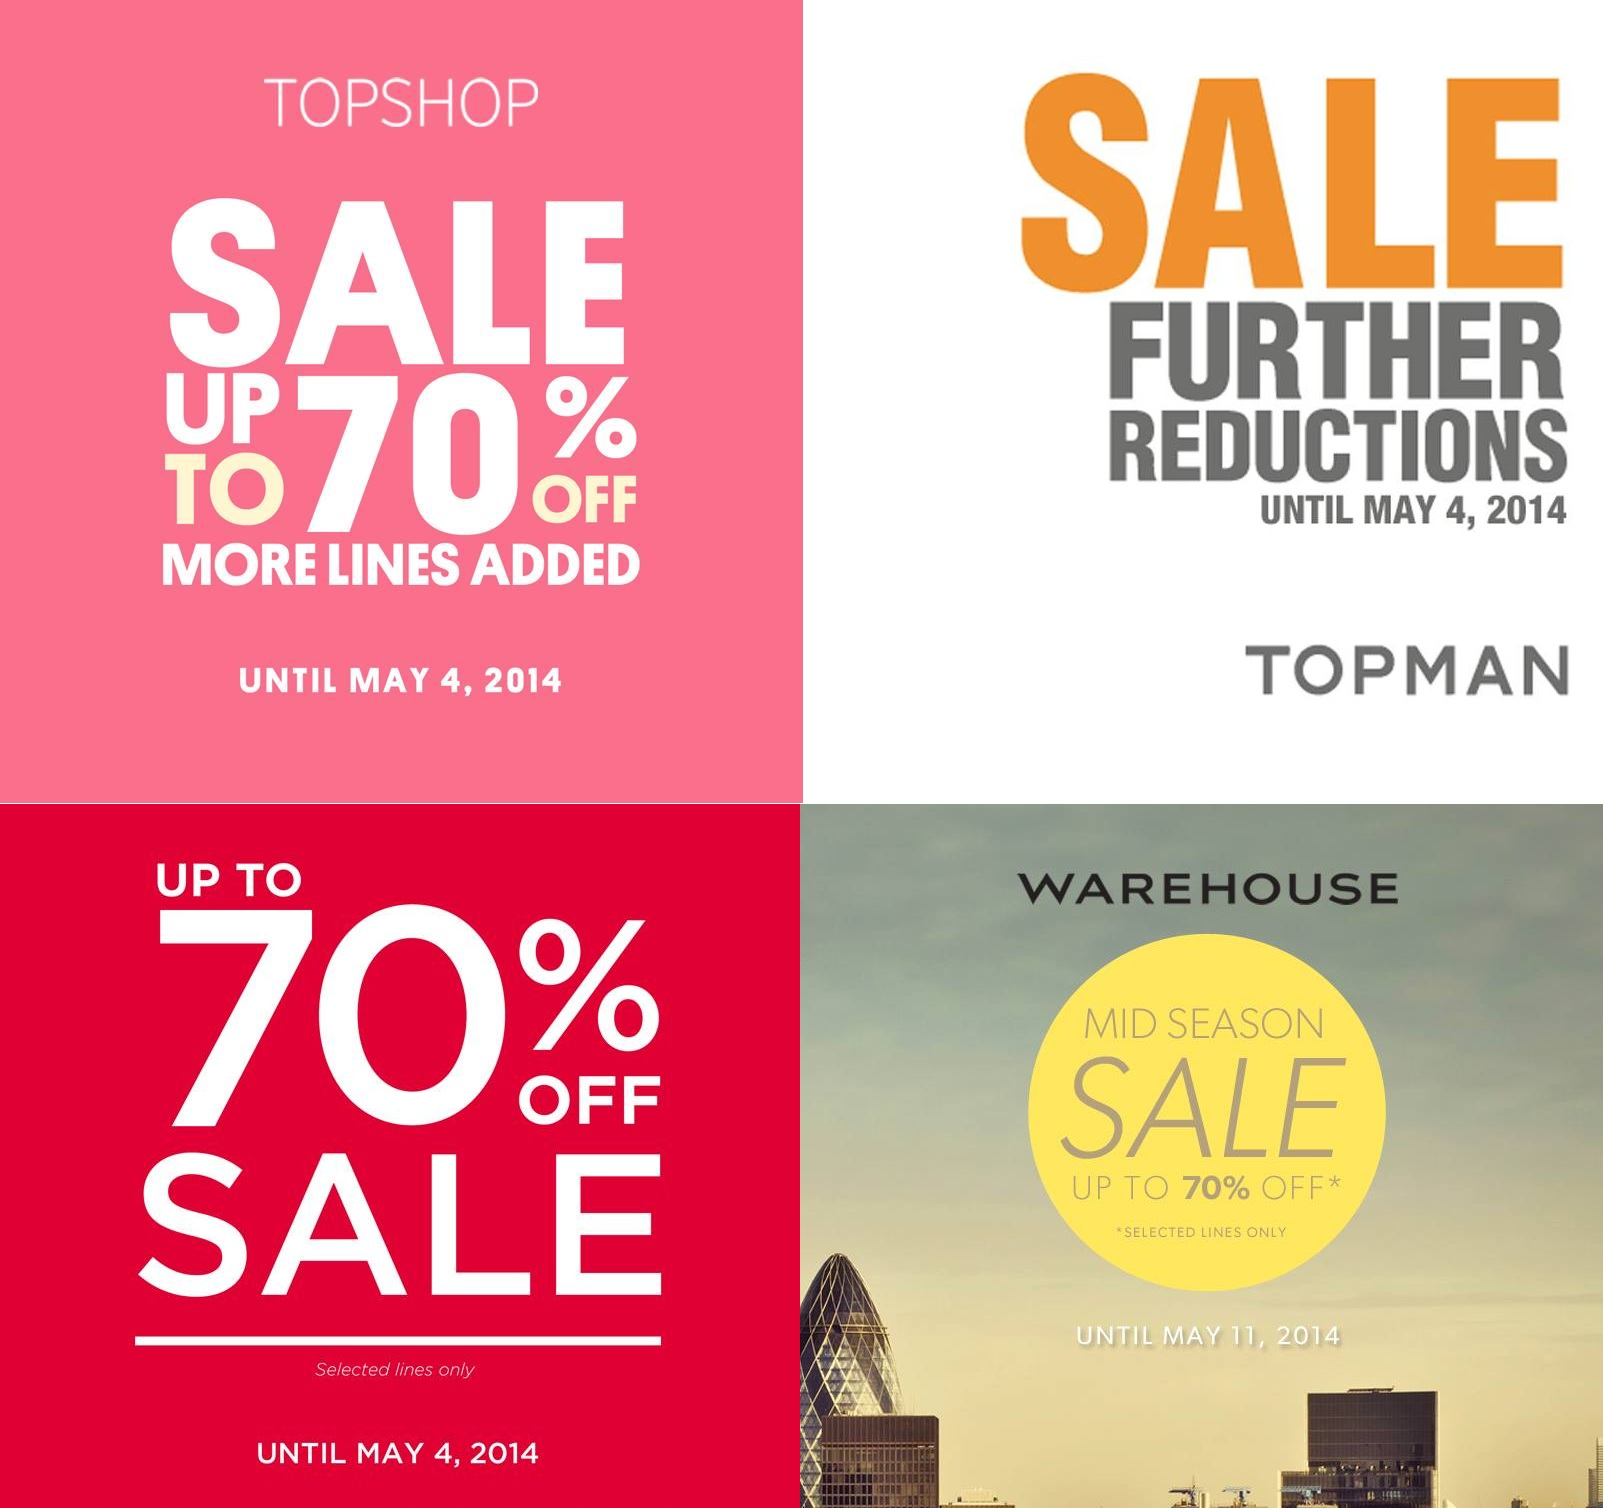 Topshop, Topman, Dorothy Perkins, & Warehouse Mid-Season Sale (Further Reductions) April - May 2014